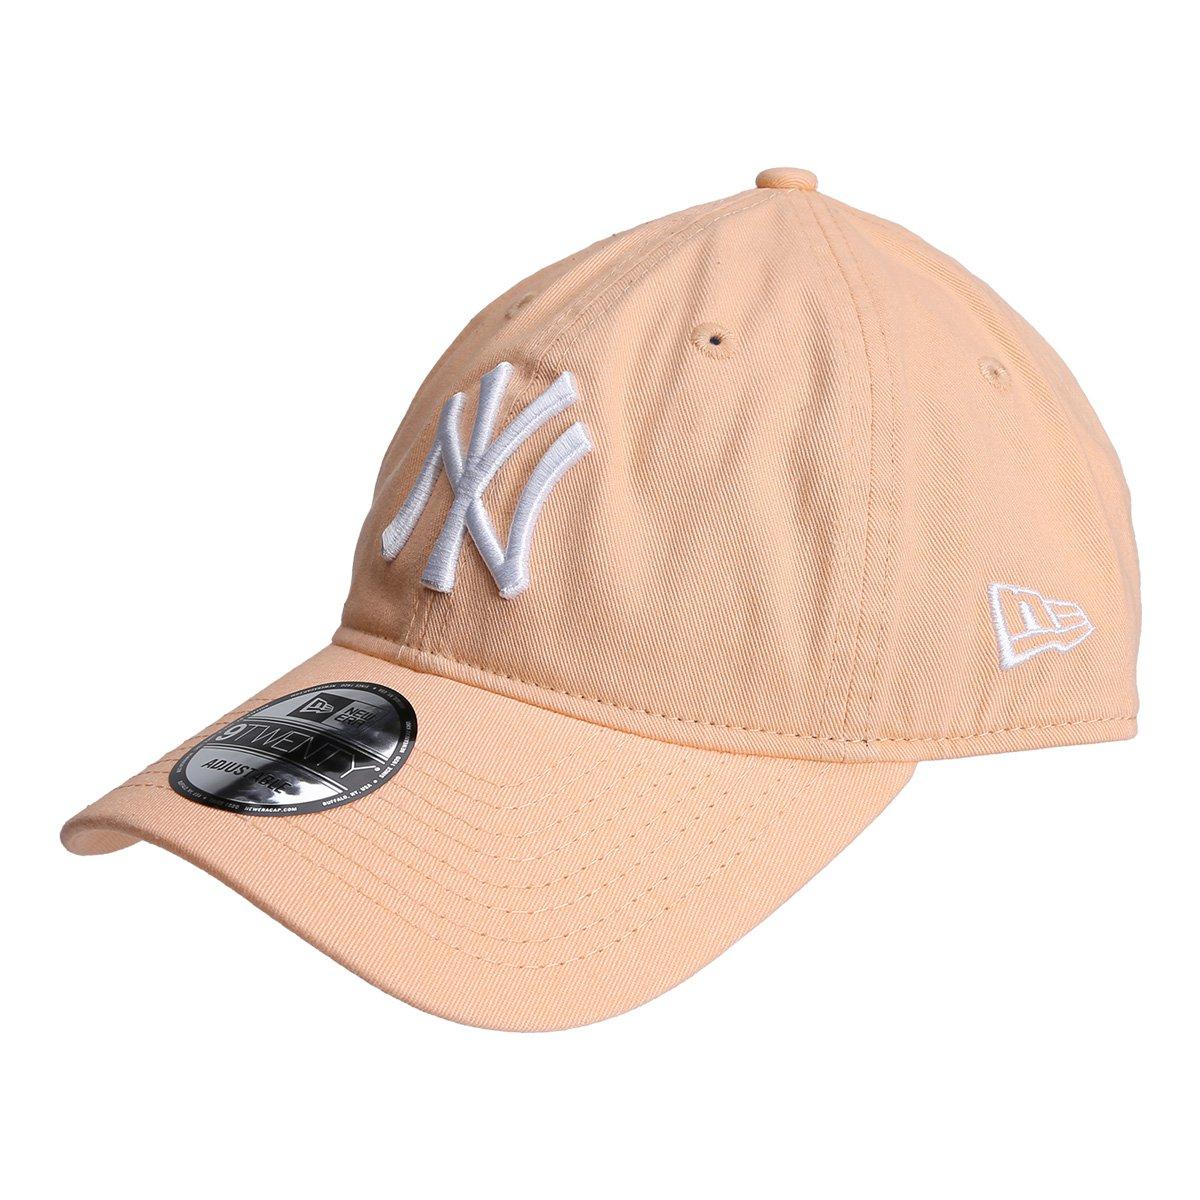 0b5d08759acc8 Boné New Era MLB New York Yankees Aba Curva 920 St Pastels - Compre ...